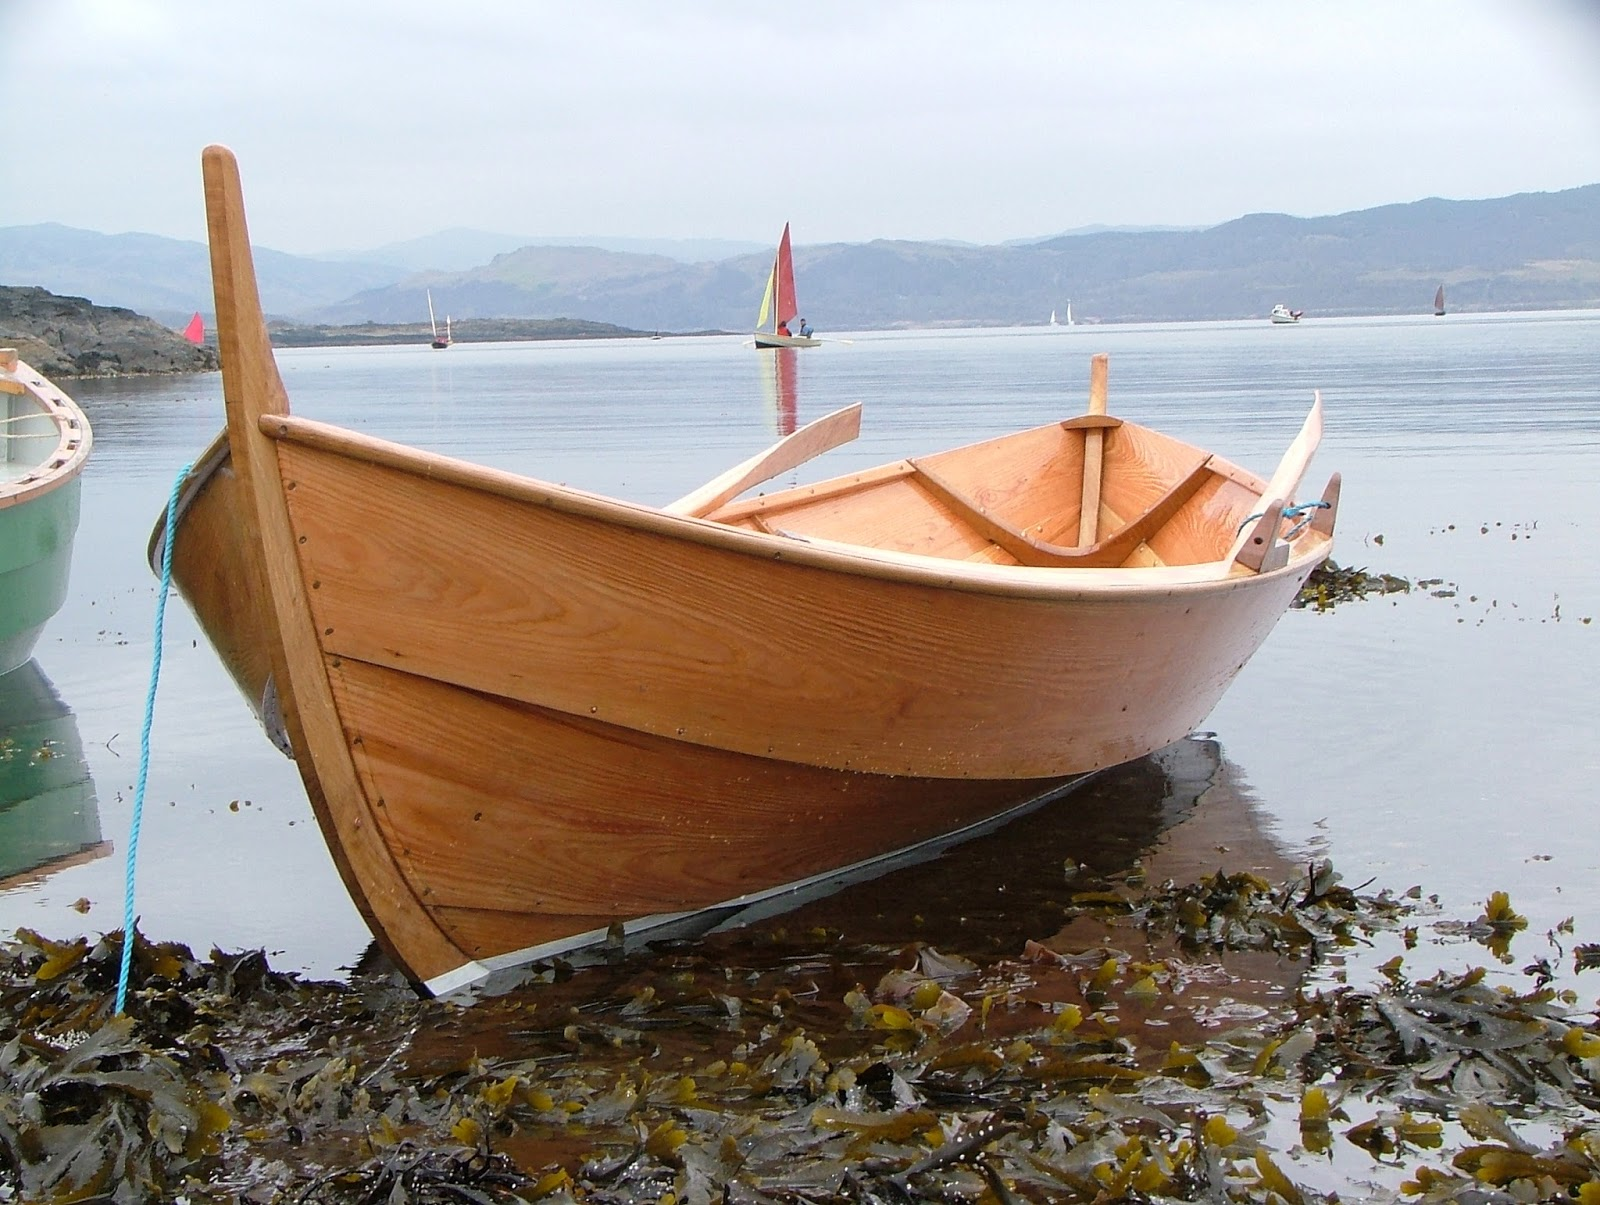 Viking Boats of Ullapool: On Reflection